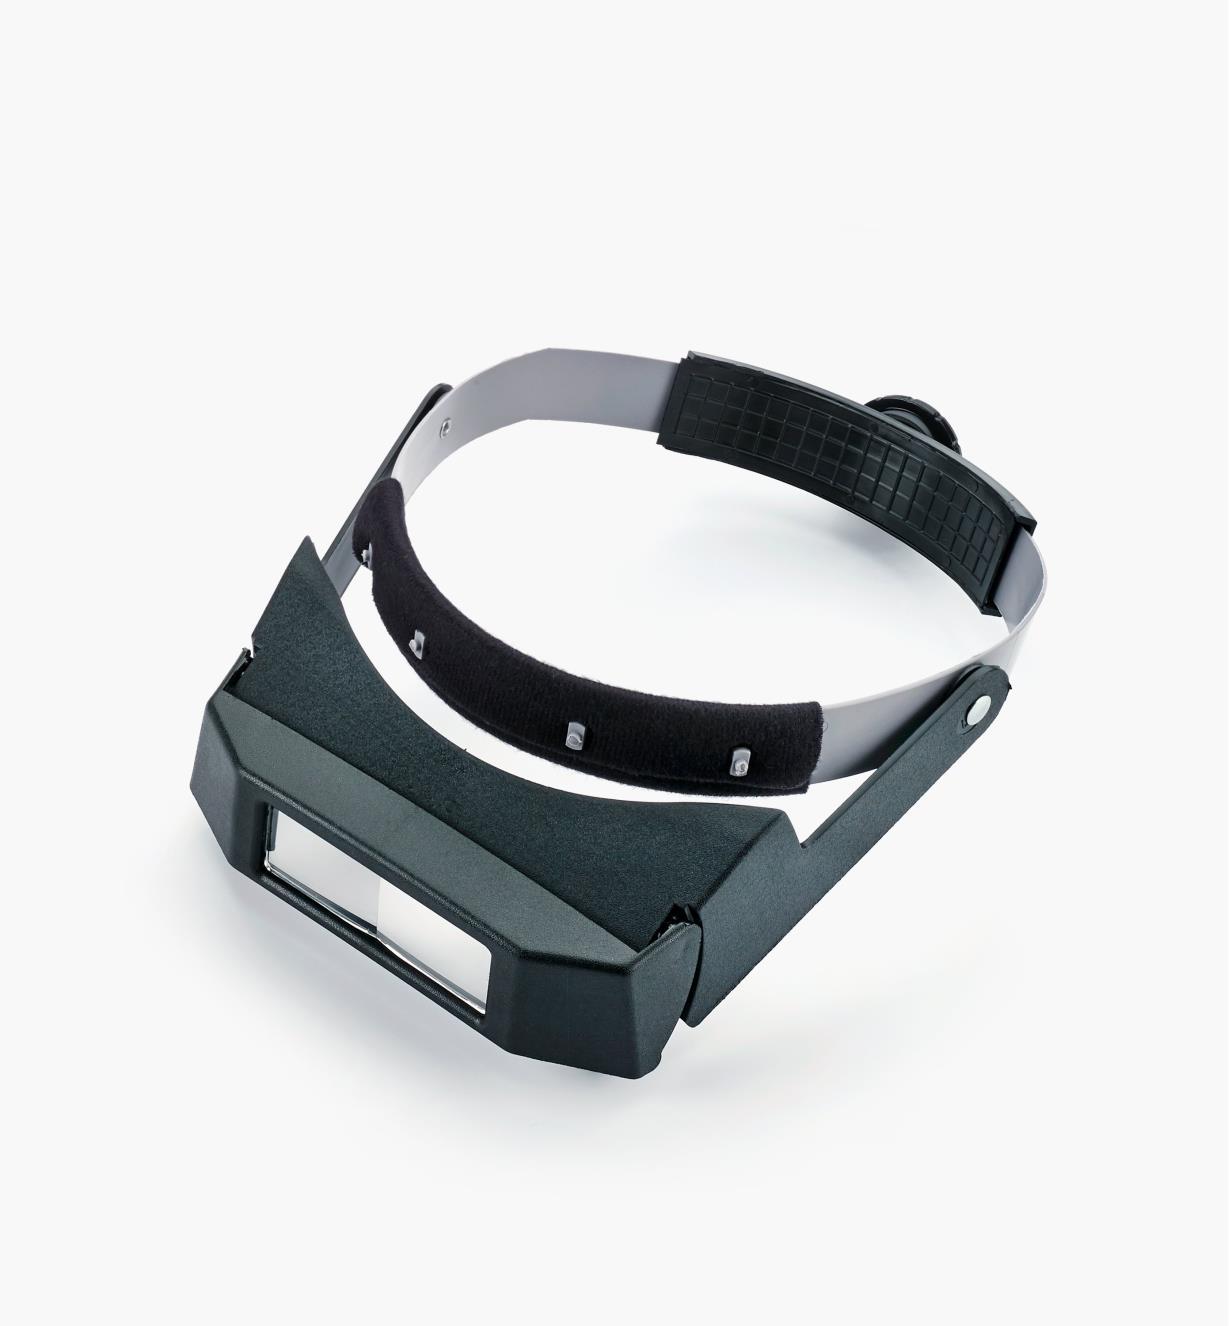 99K2010 - Binocular Magnifier